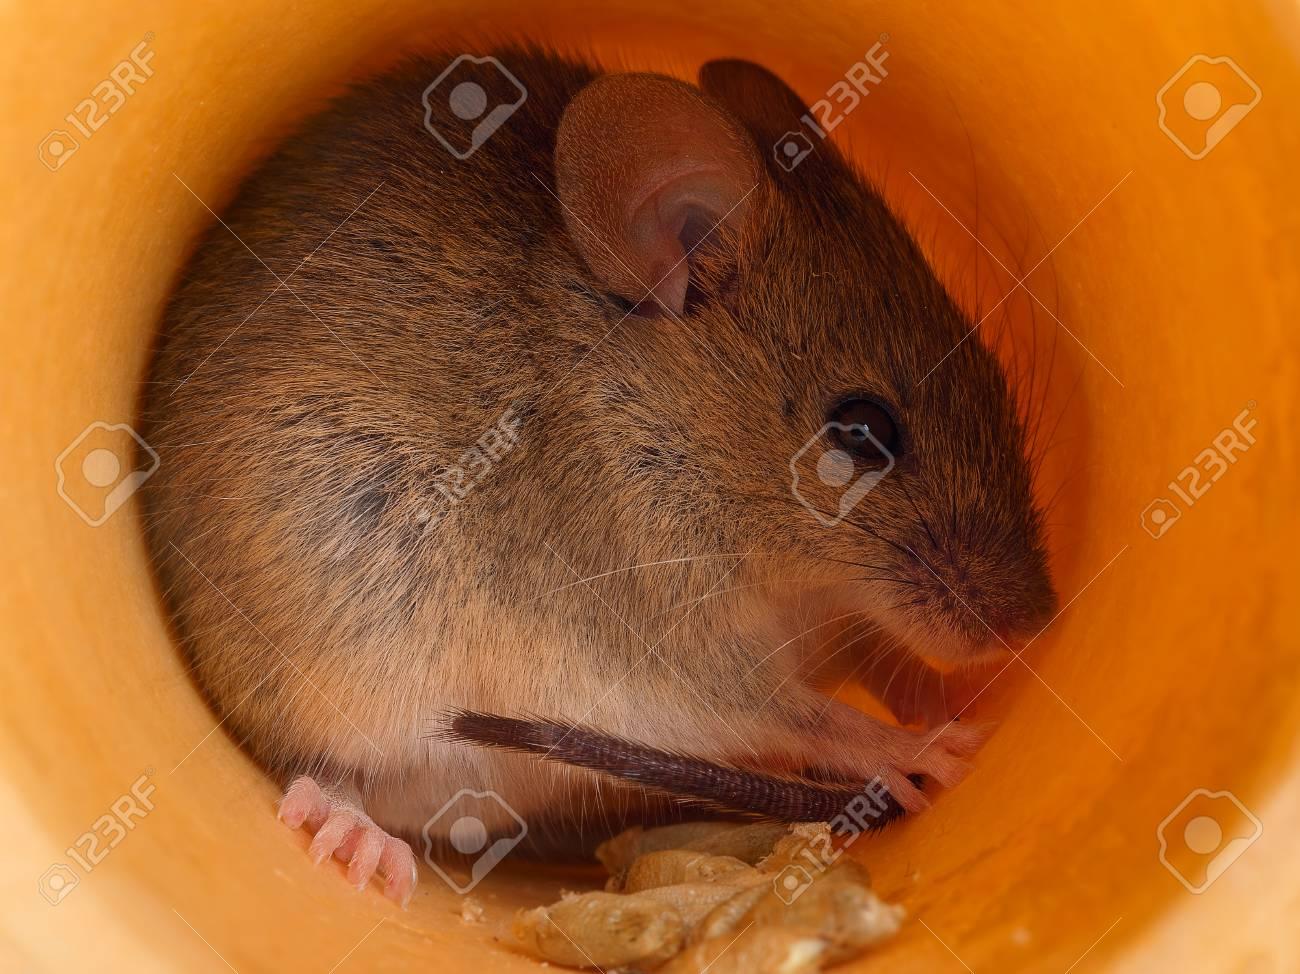 closeup field cute gray mouse (Apodemus) hides inside of hole Standard-Bild - 93063140